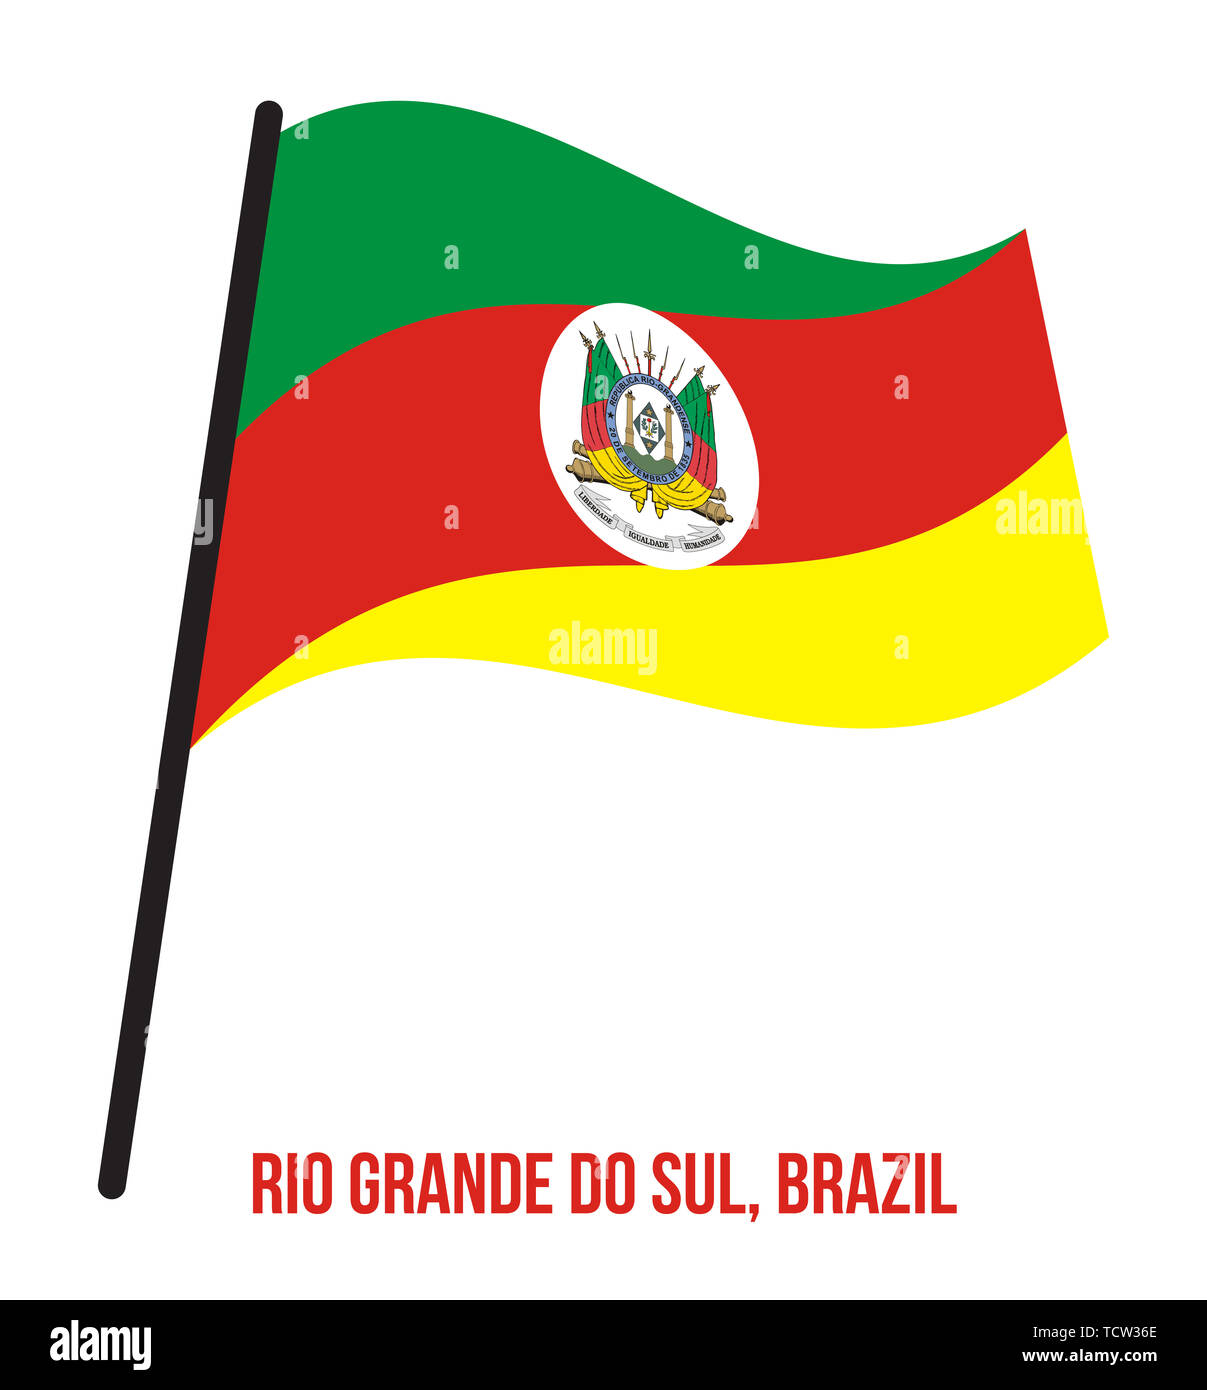 Rio Grande do Sul Flag Waving Vector Illustration on White Background. States Flag of Brazil. Stock Photo